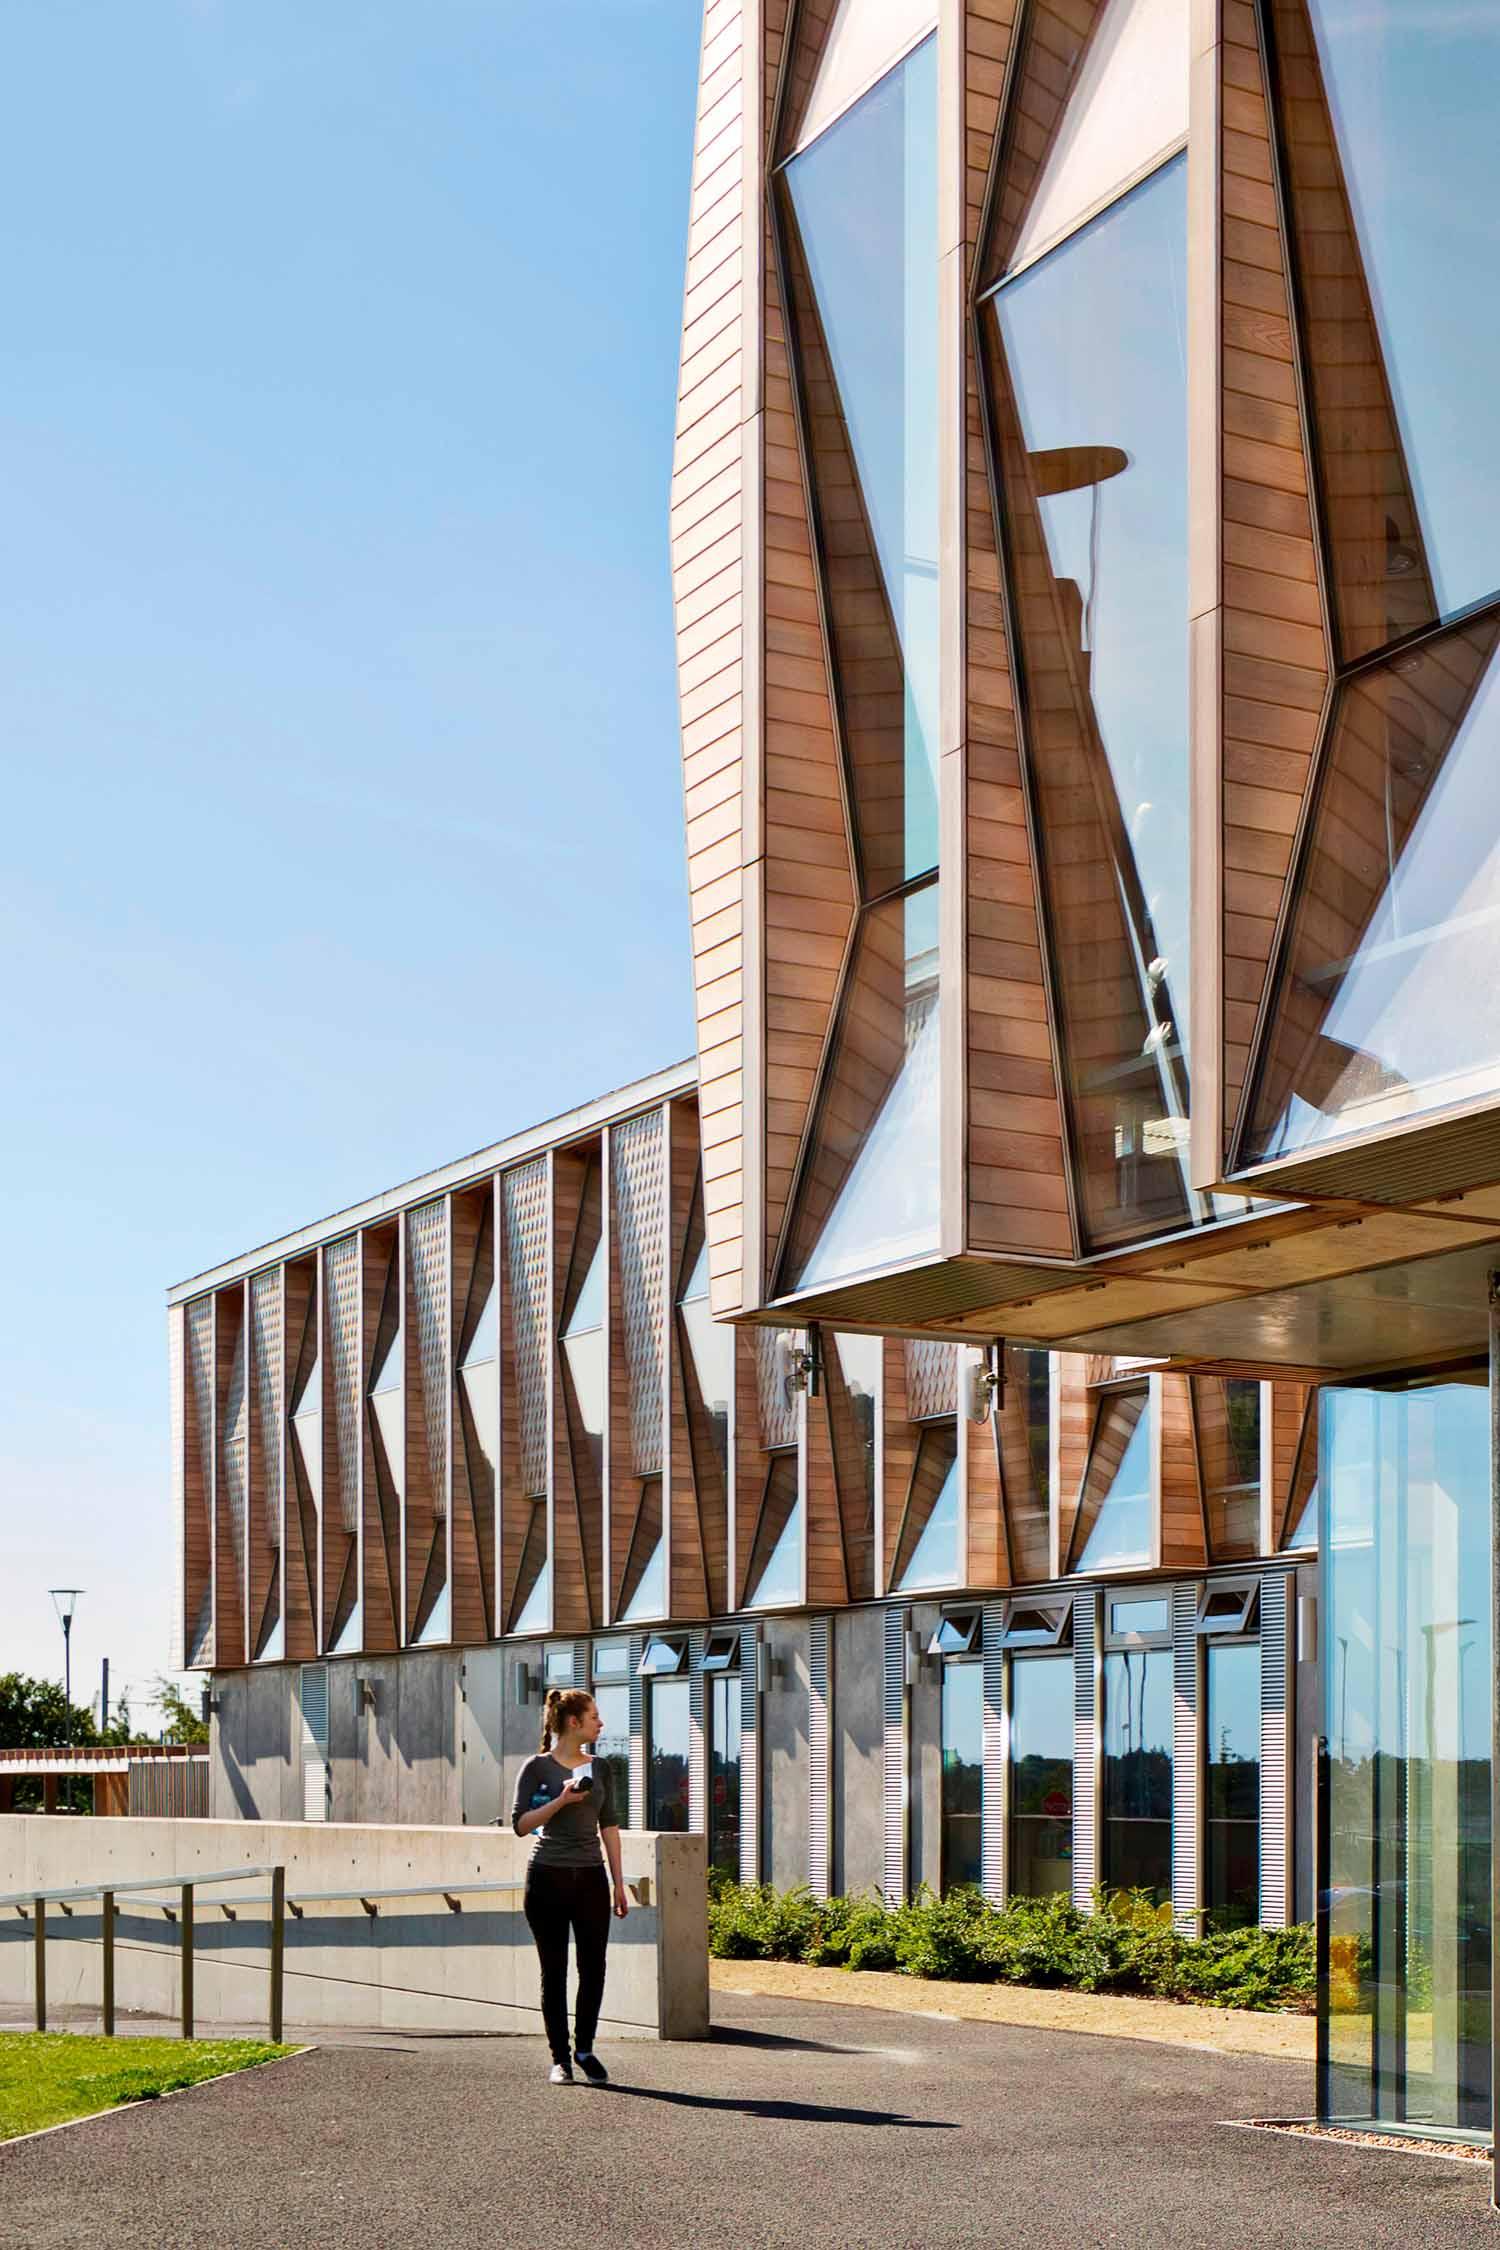 Centro comunitario multifunzionale Samuel Beckett, Dublino, Irlanda, 2016